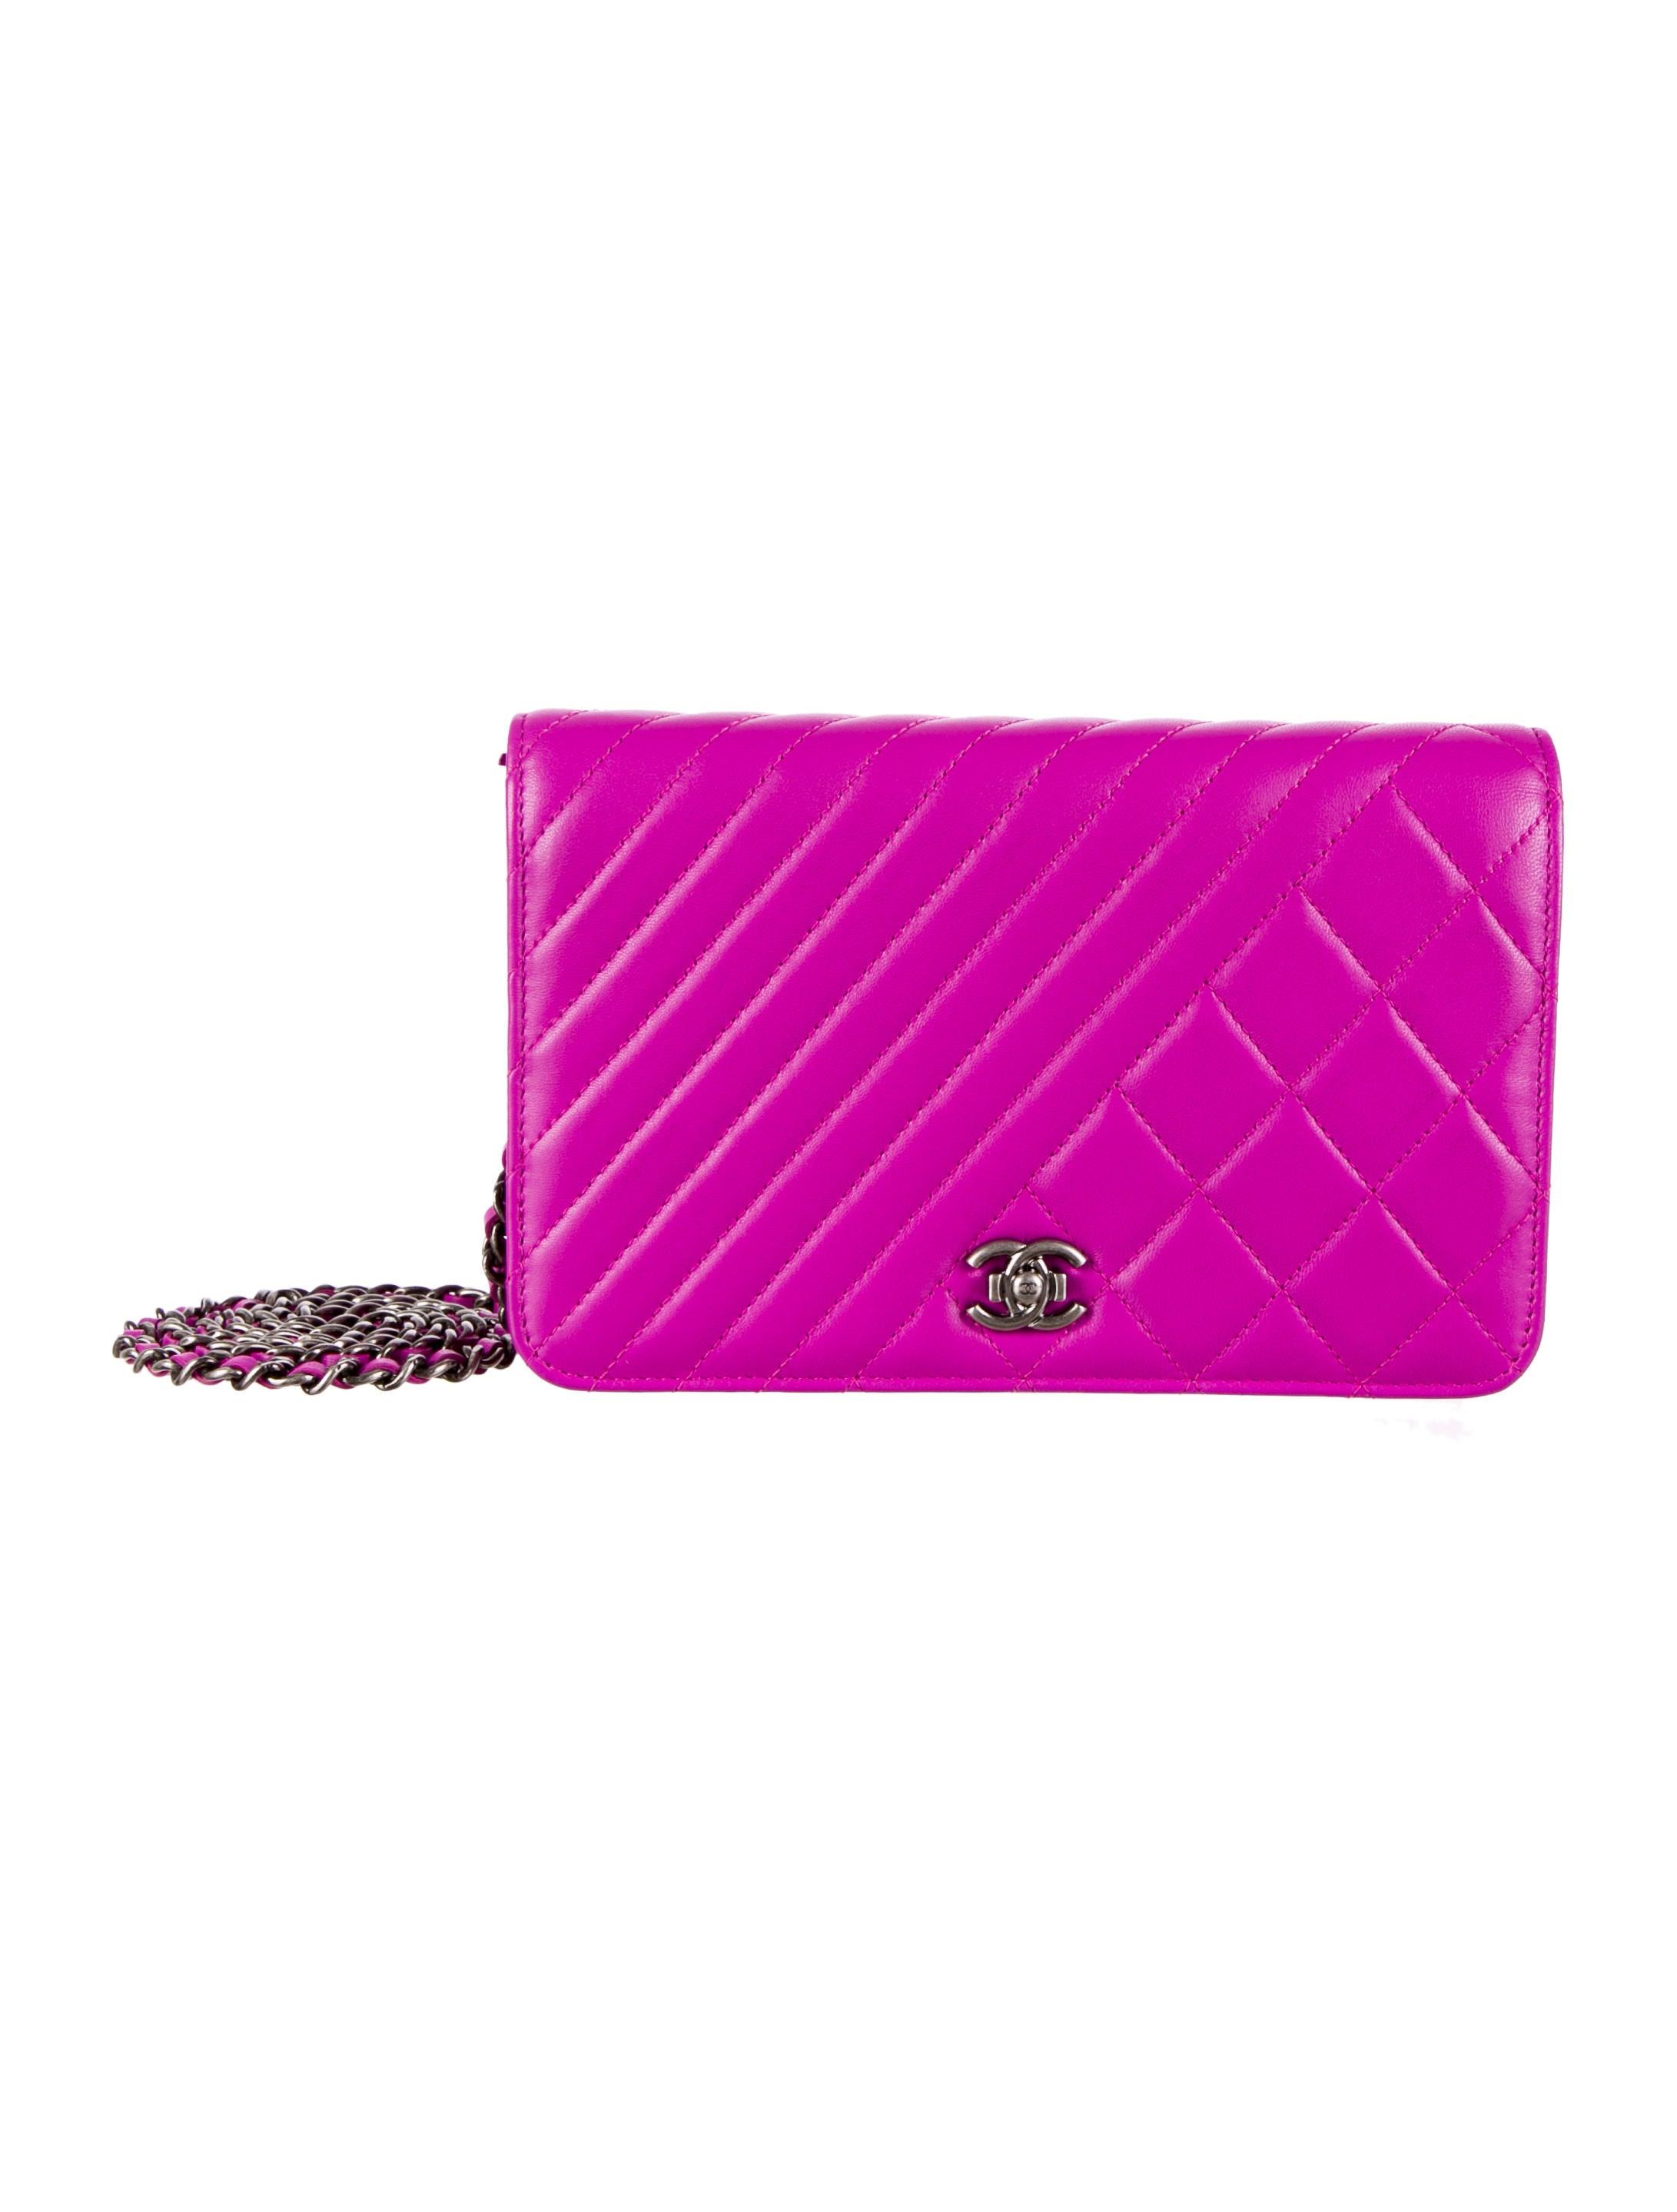 fc4a4f5e04d54f Chanel Coco Boy Wallet On Chain - Handbags - CHA84214 | The RealReal